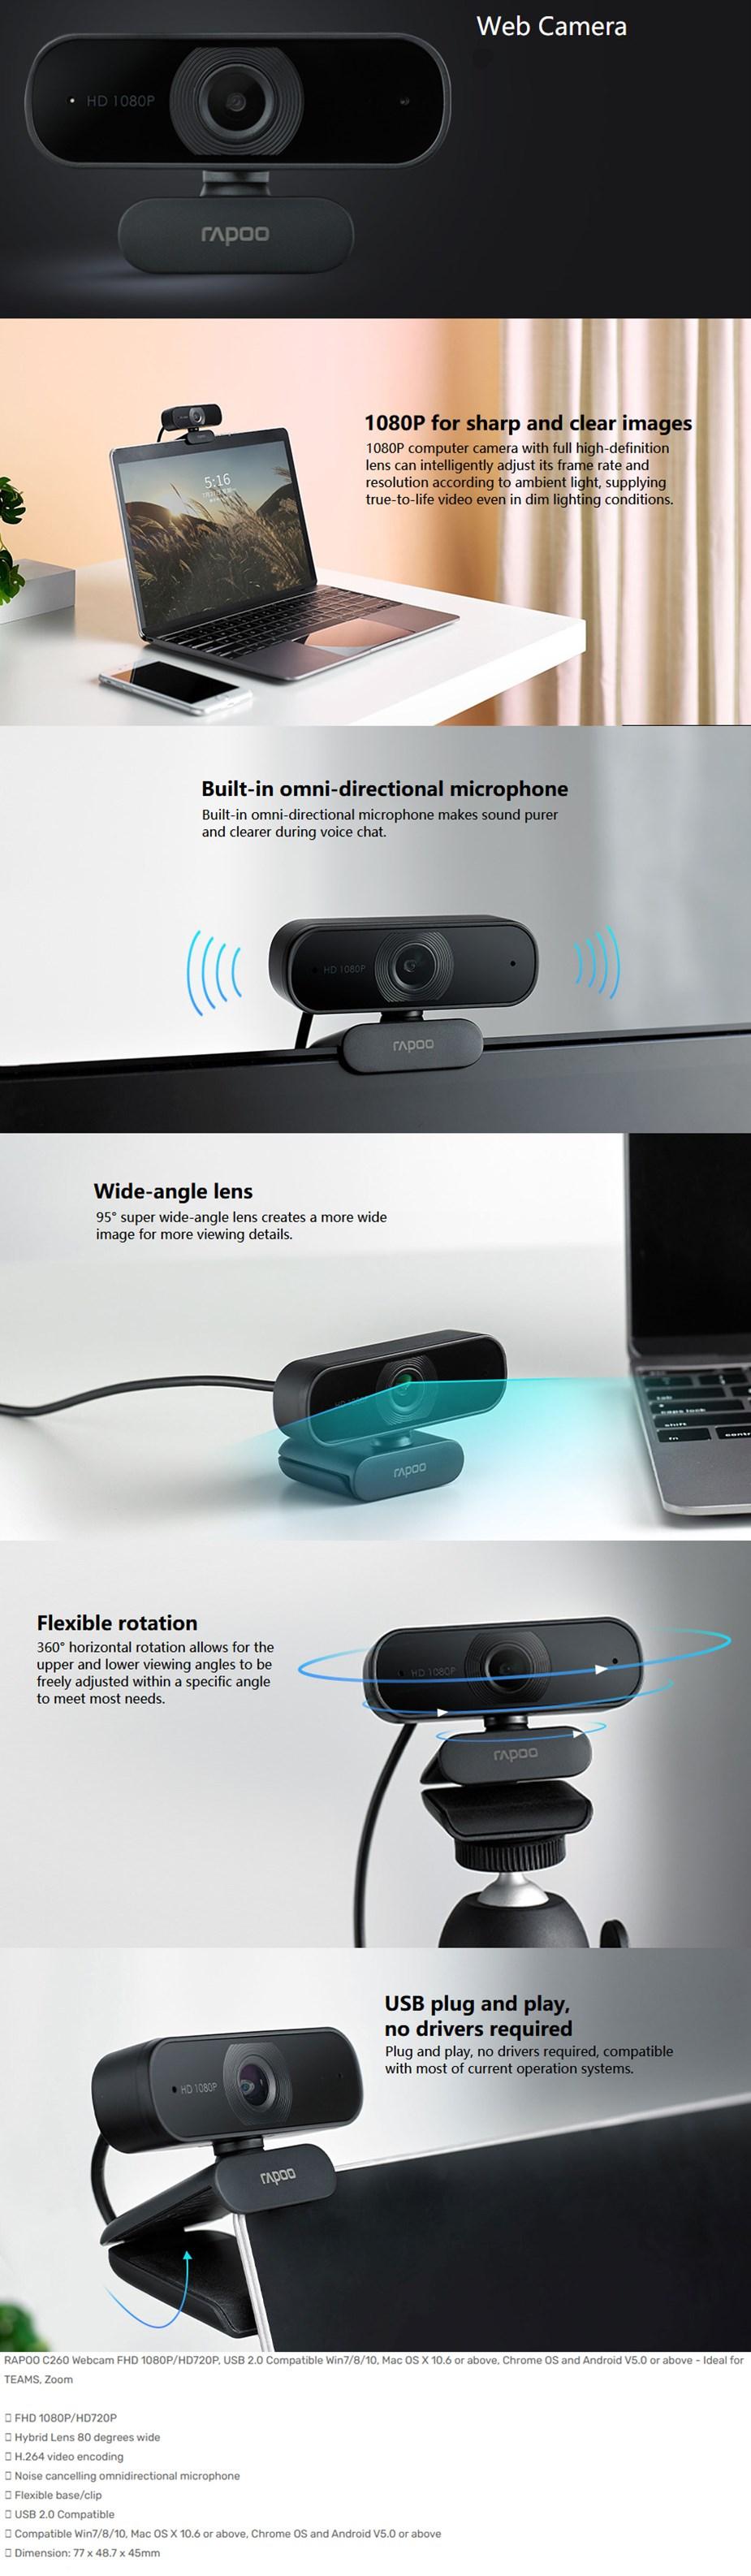 rapoo-c260-fhd-1080p-webcam-ac37815-2.jpg